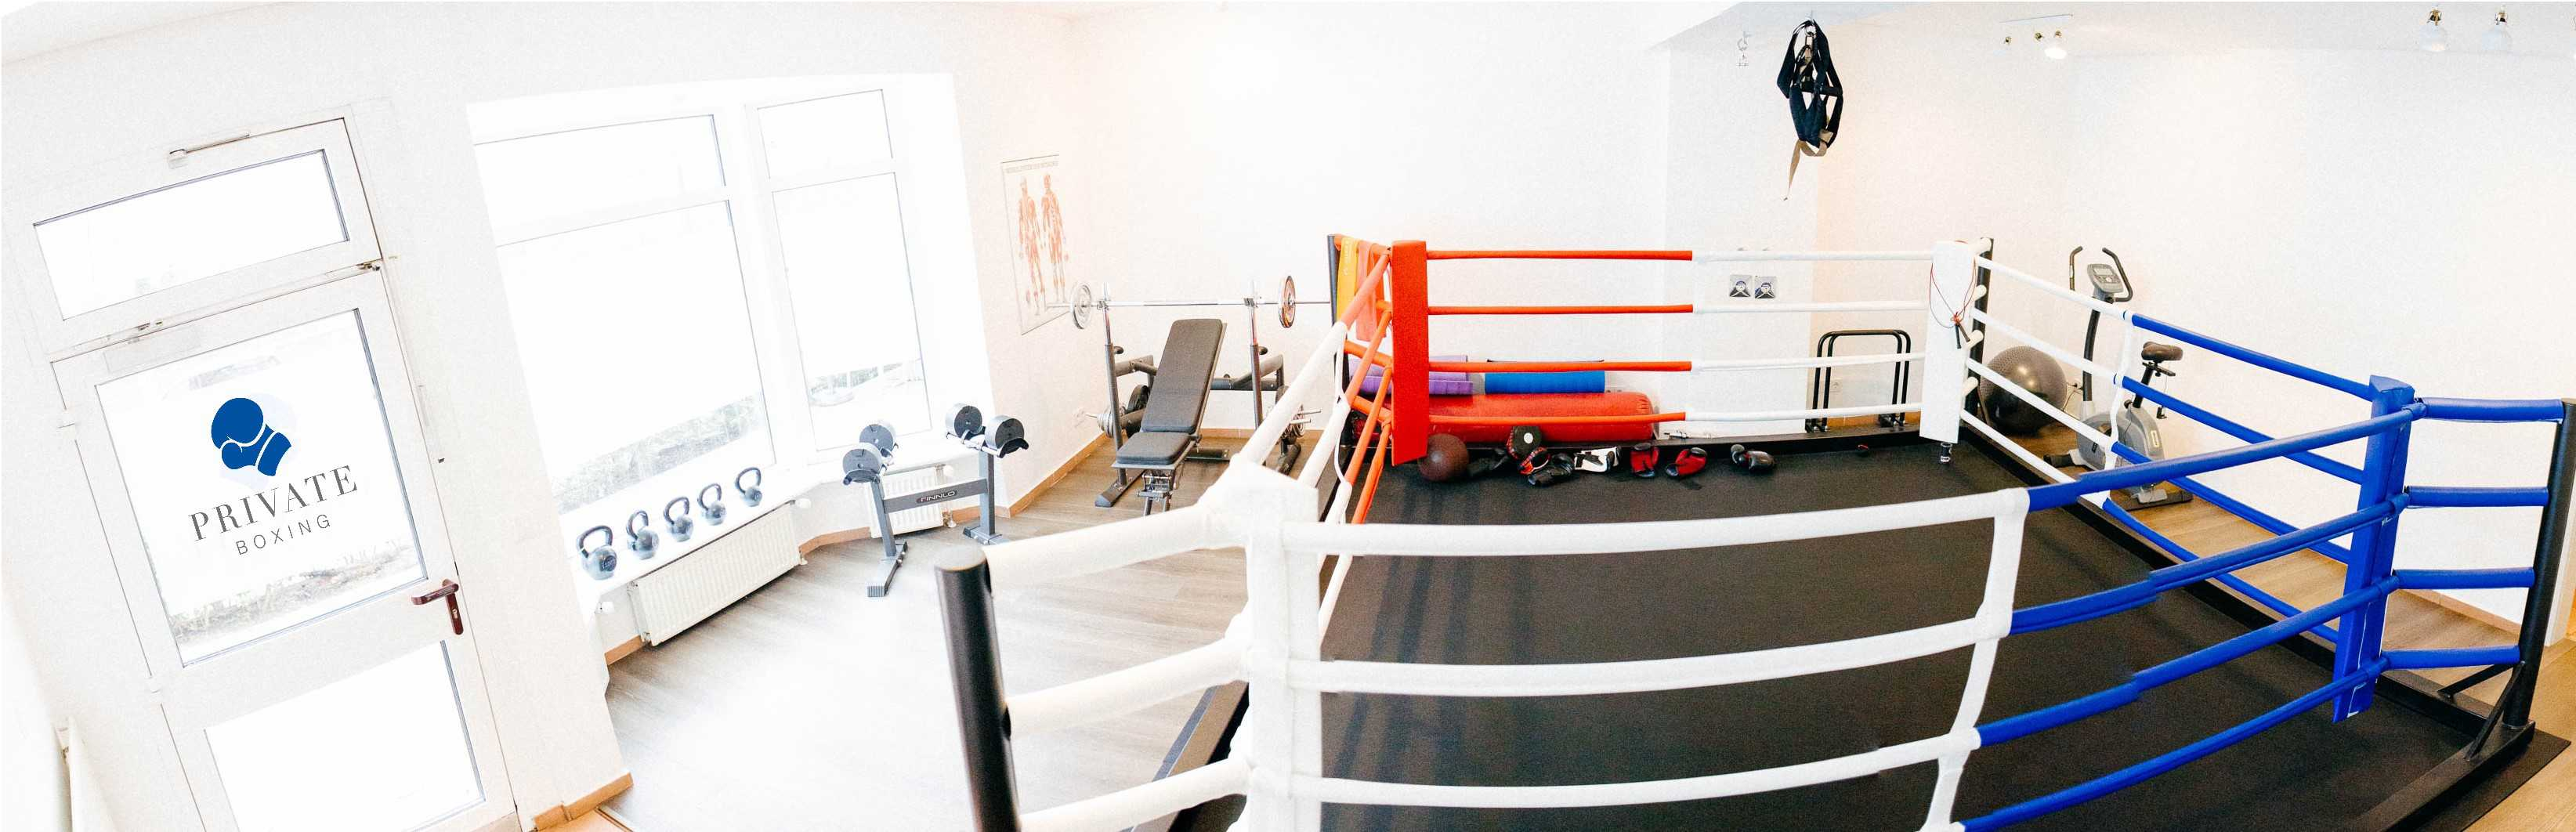 Private Boxing Gym - Personal training Hamburg